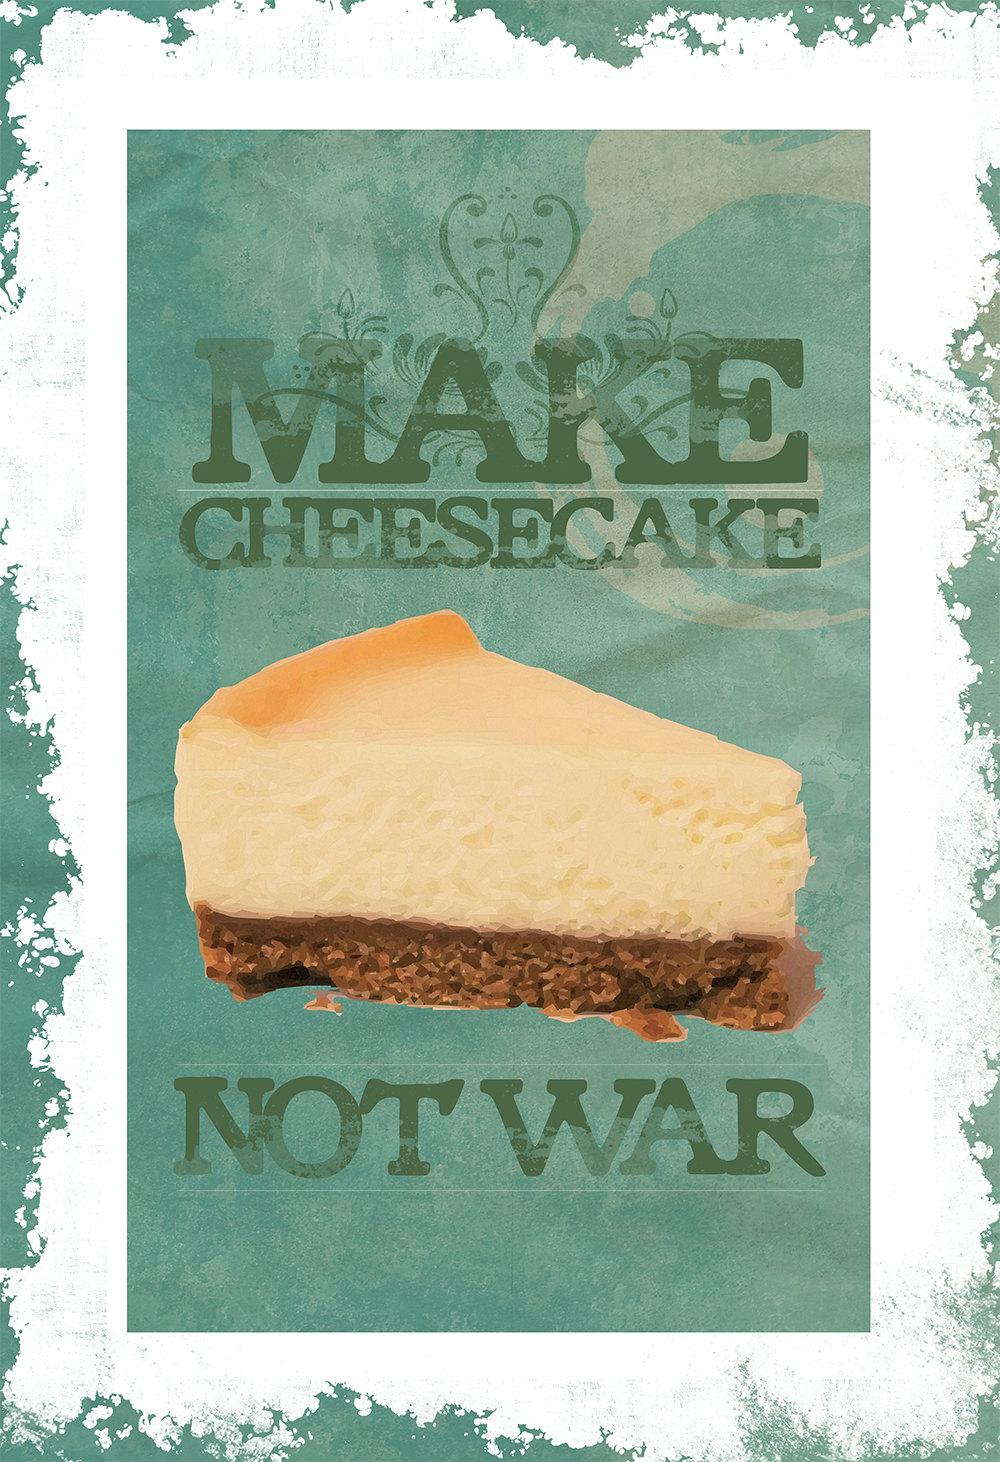 Make Cheesecake Not War Print Original Illustration Vintage Style Ad ...